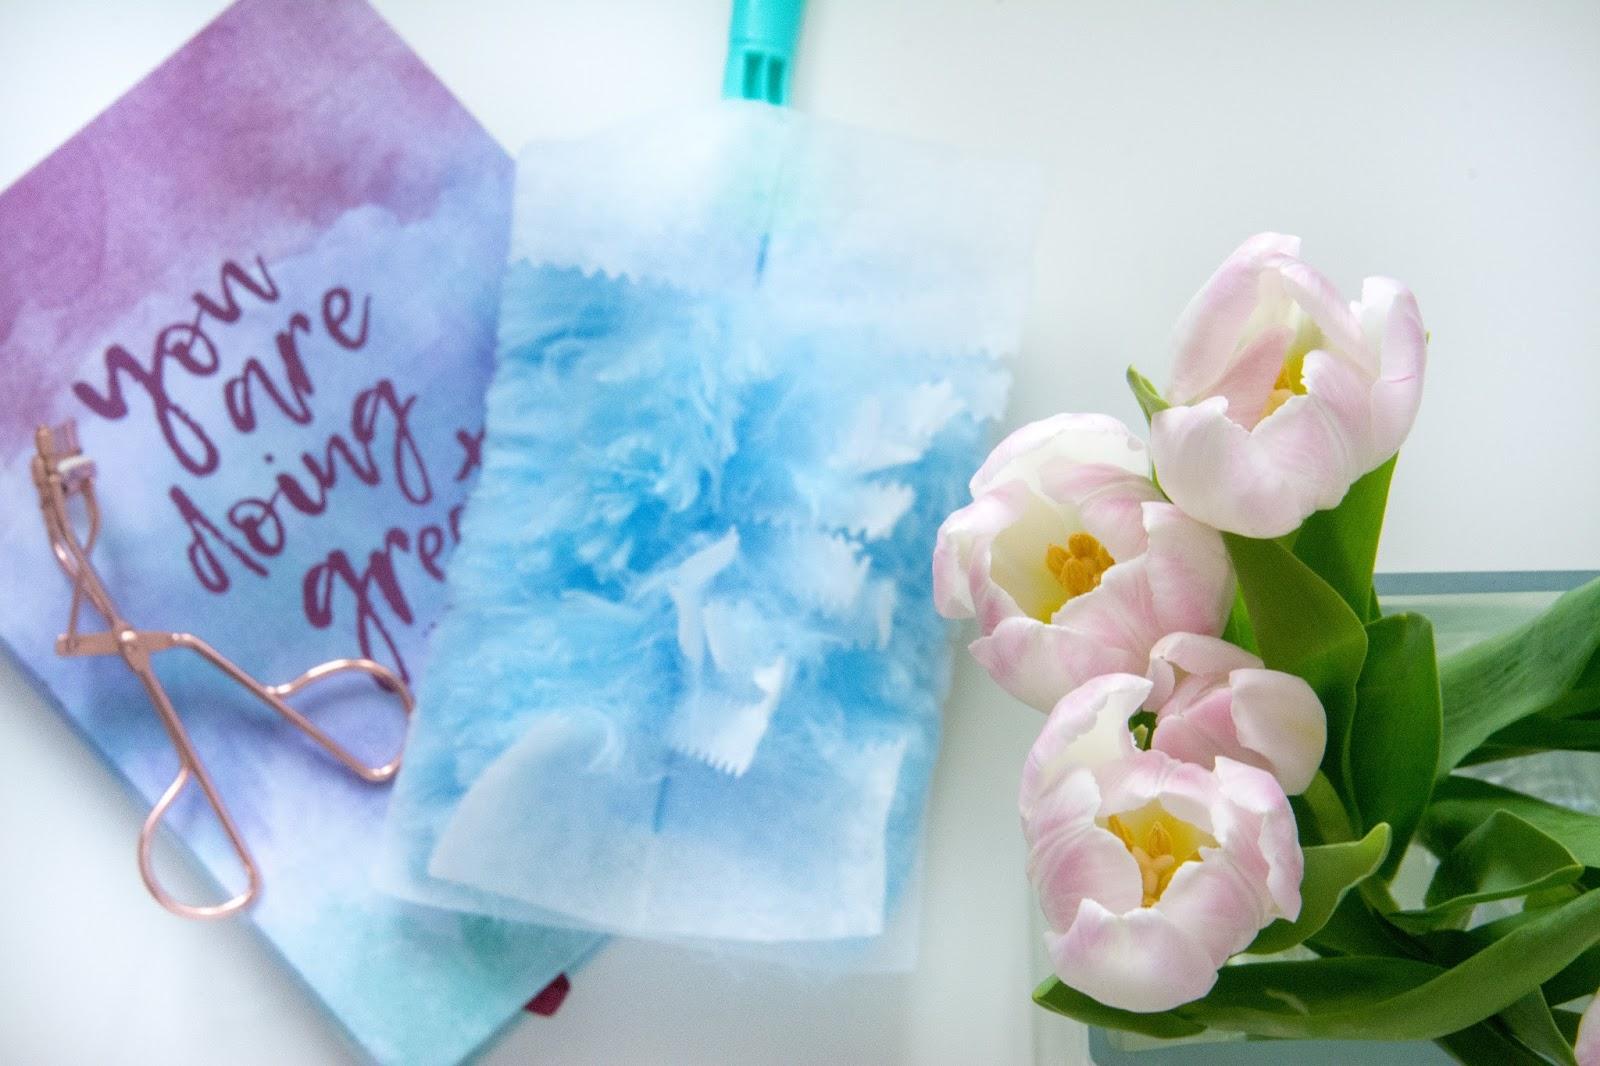 Primark Rosegold Eyelash Curler; Hema Notebook You Are Doing Great; Fresh Tulips; Rossman Staubmagnet